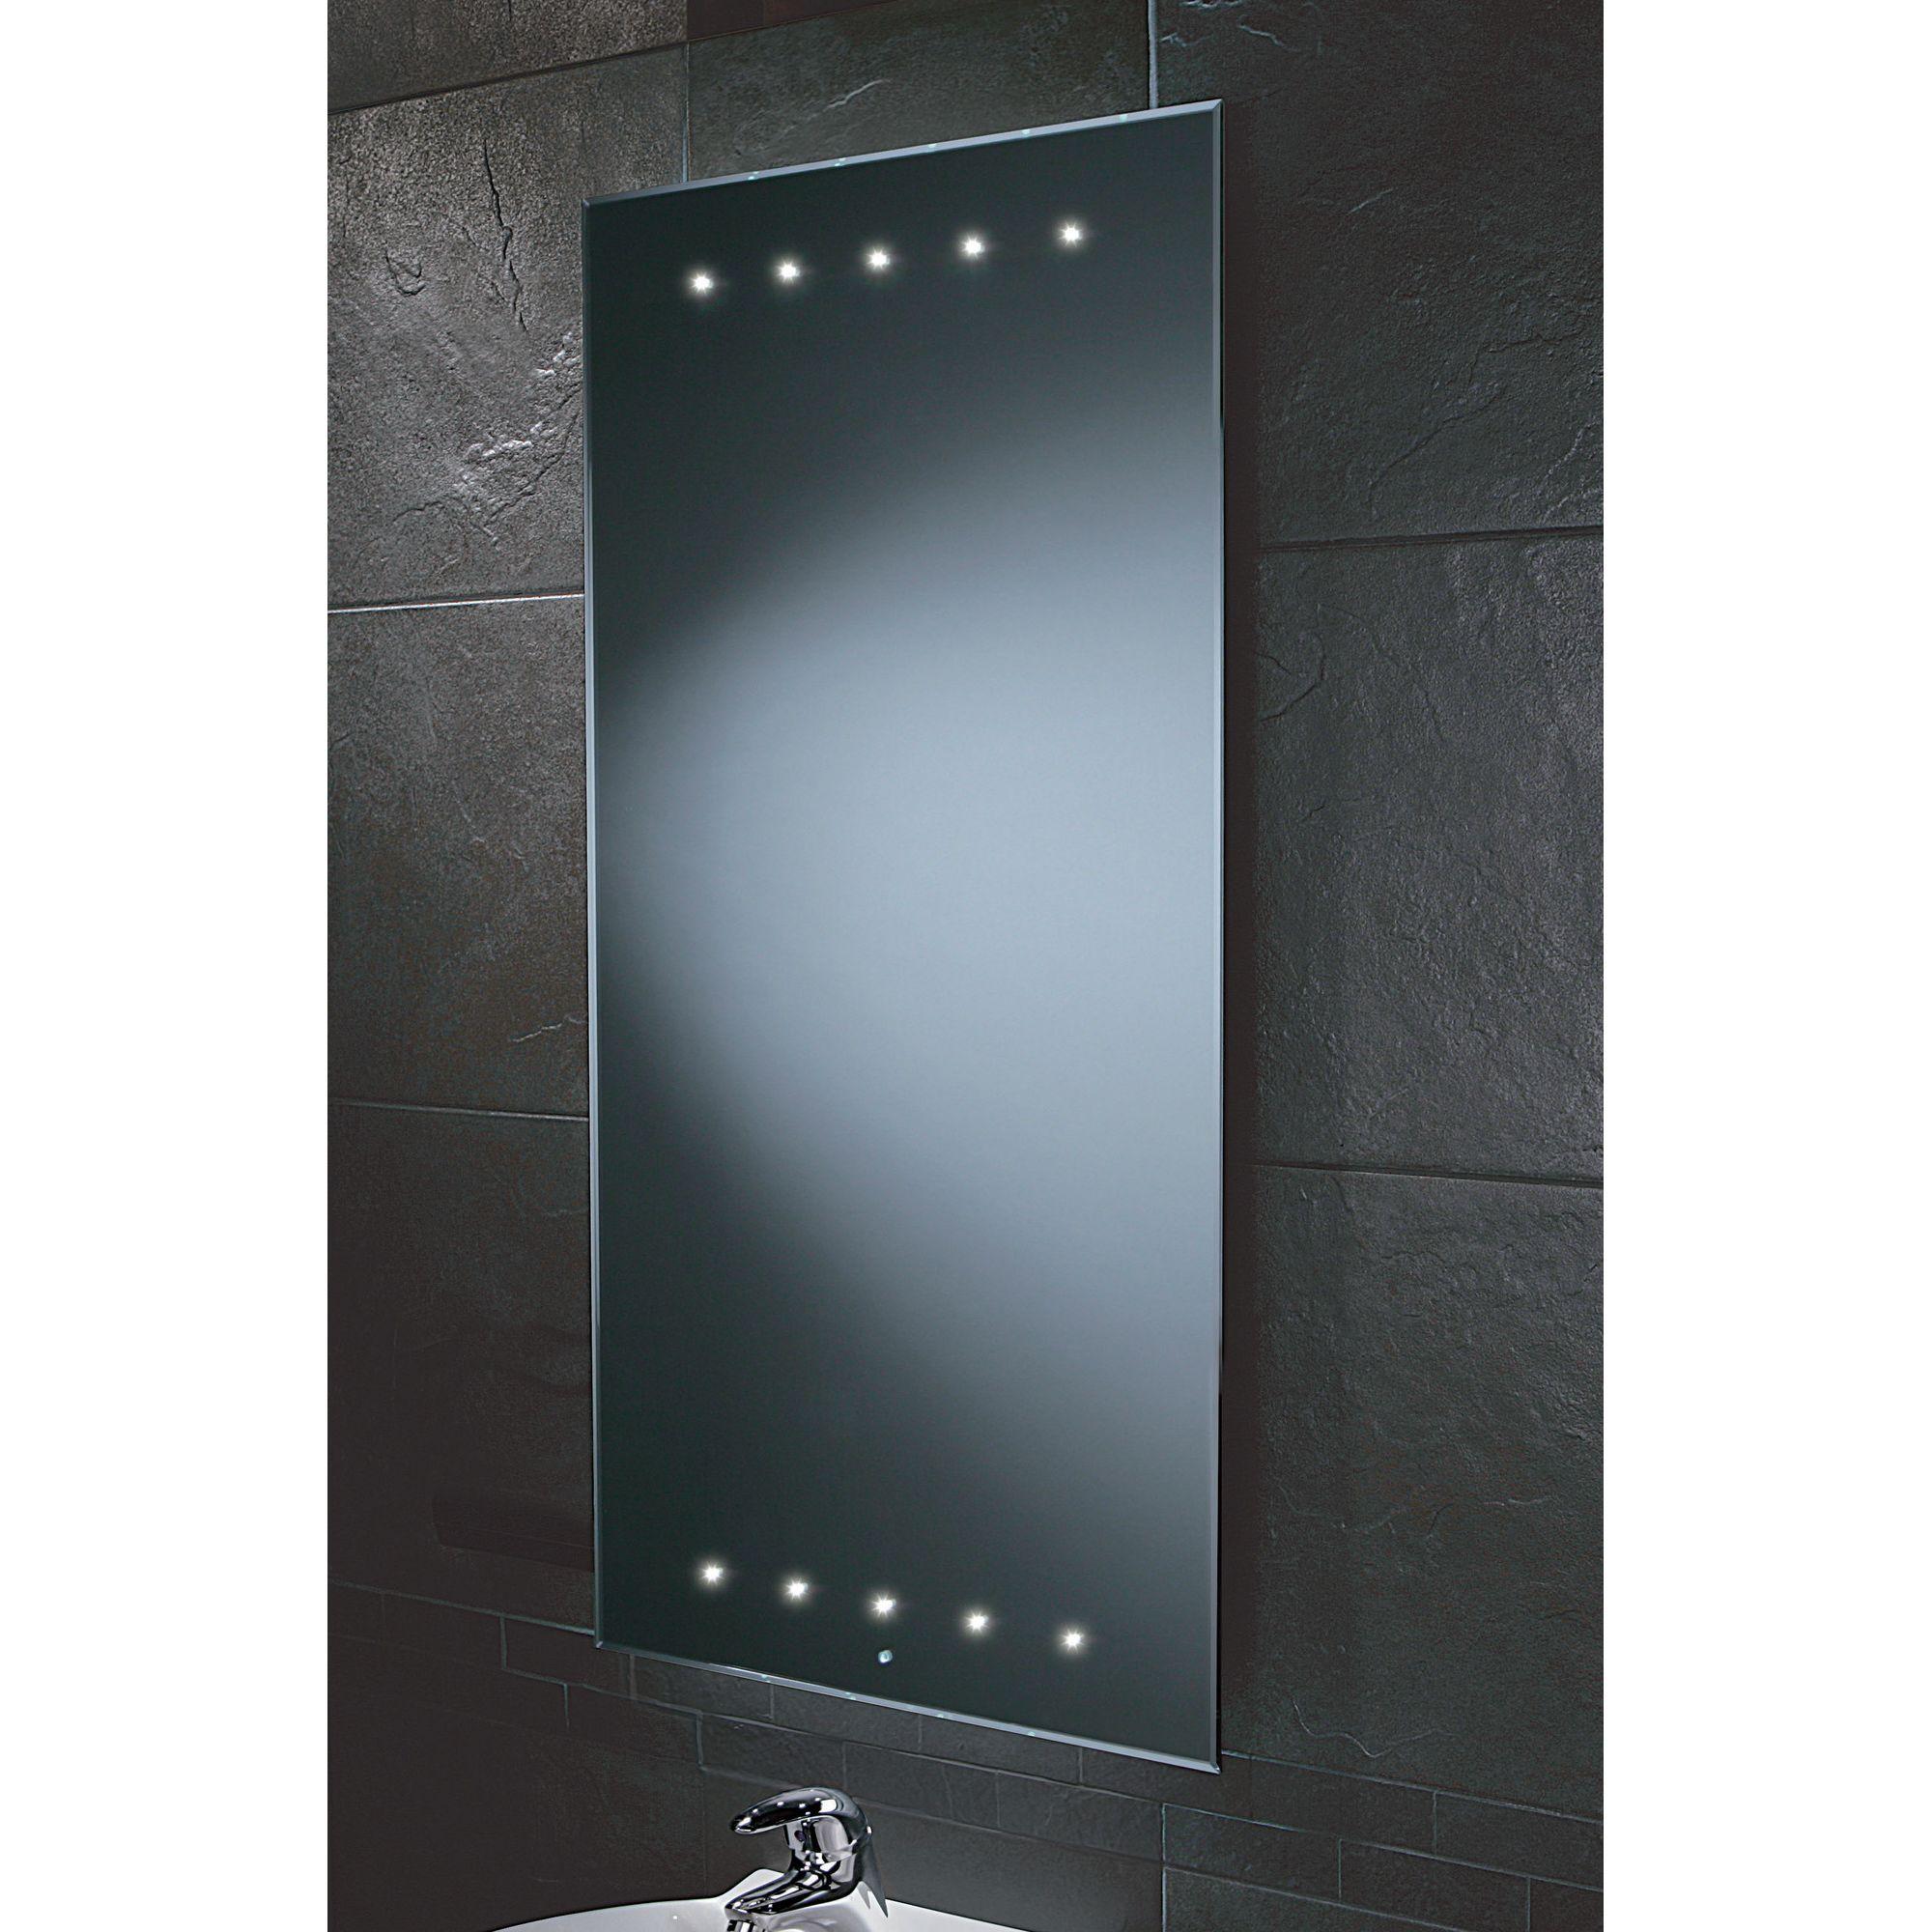 HIB Inca Mirror at Tesco Direct